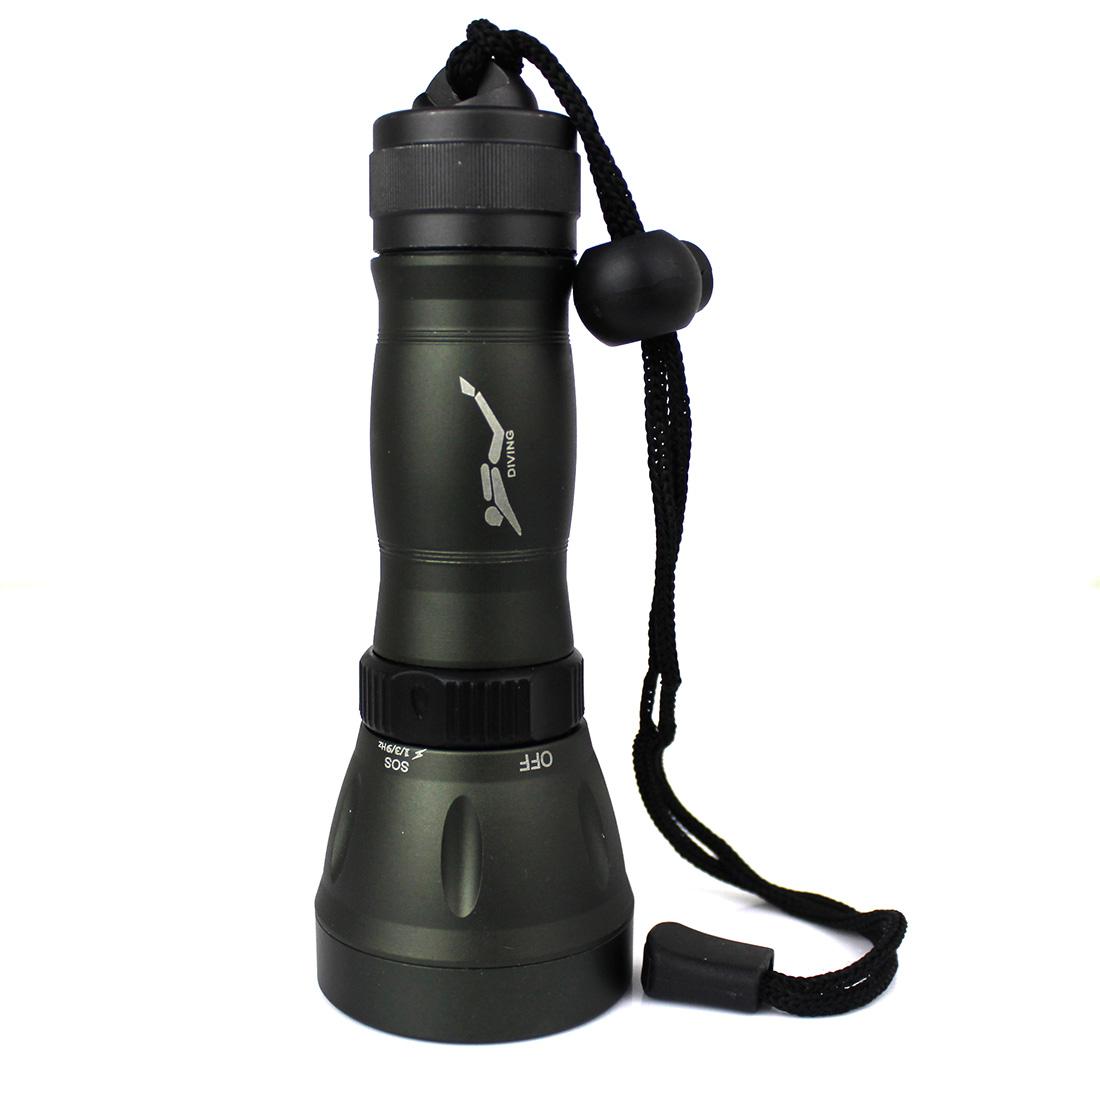 High Quality 2015 Hot 1200 Lumen CREE-T6 LED Diving Flash Flashlight Torch Light Lamp Grey 8 Modes Waterproof 20M Zaklamp 18650 <br><br>Aliexpress